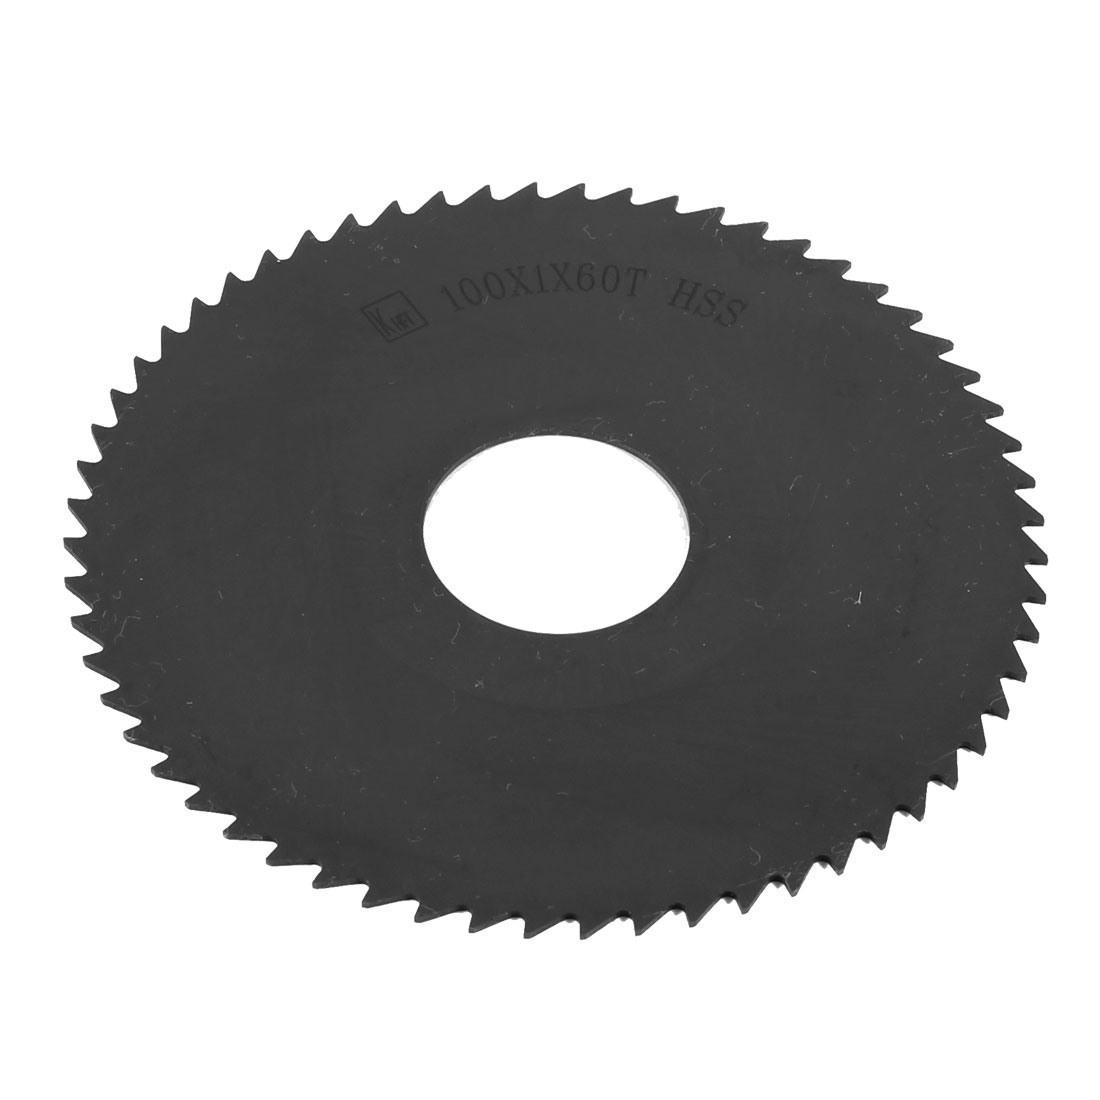 Hand Tool 100mm x 22mm x 1mm 60 Peg Teeth HSS Slitting Saw Cutter